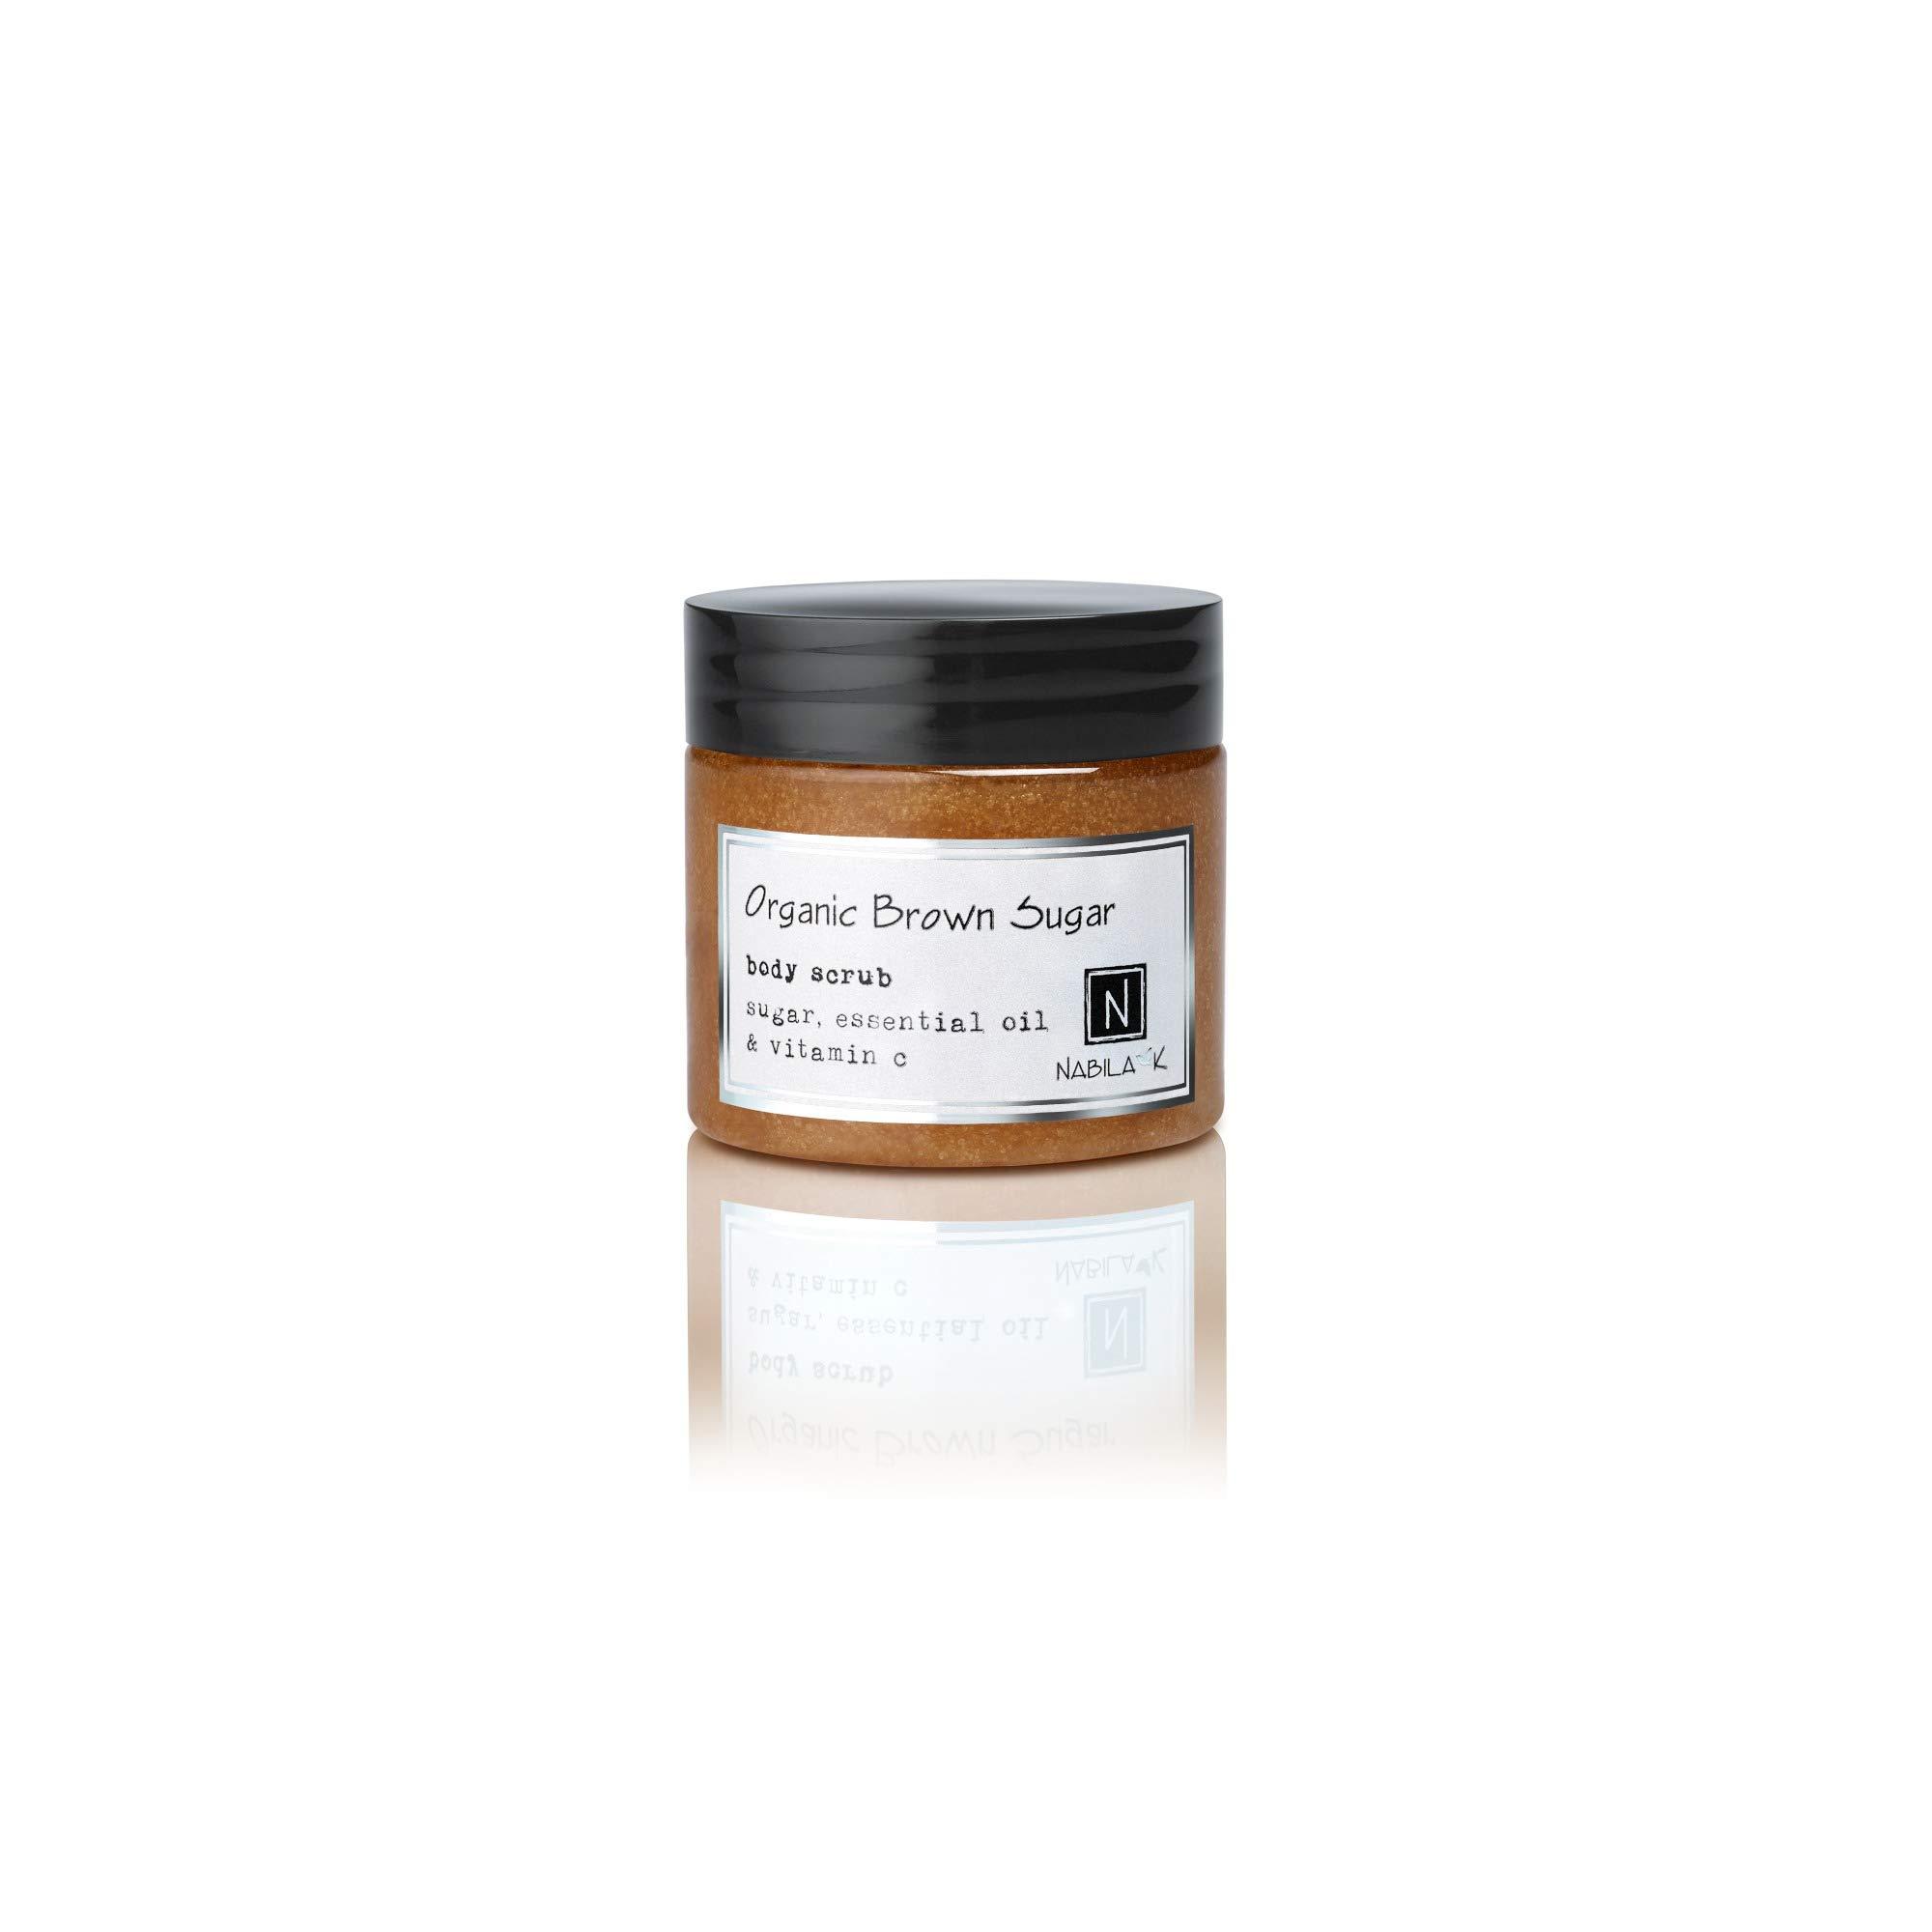 Organic Brown Sugar Body Scrub, Exfoliates & Moisturizes, 3oz